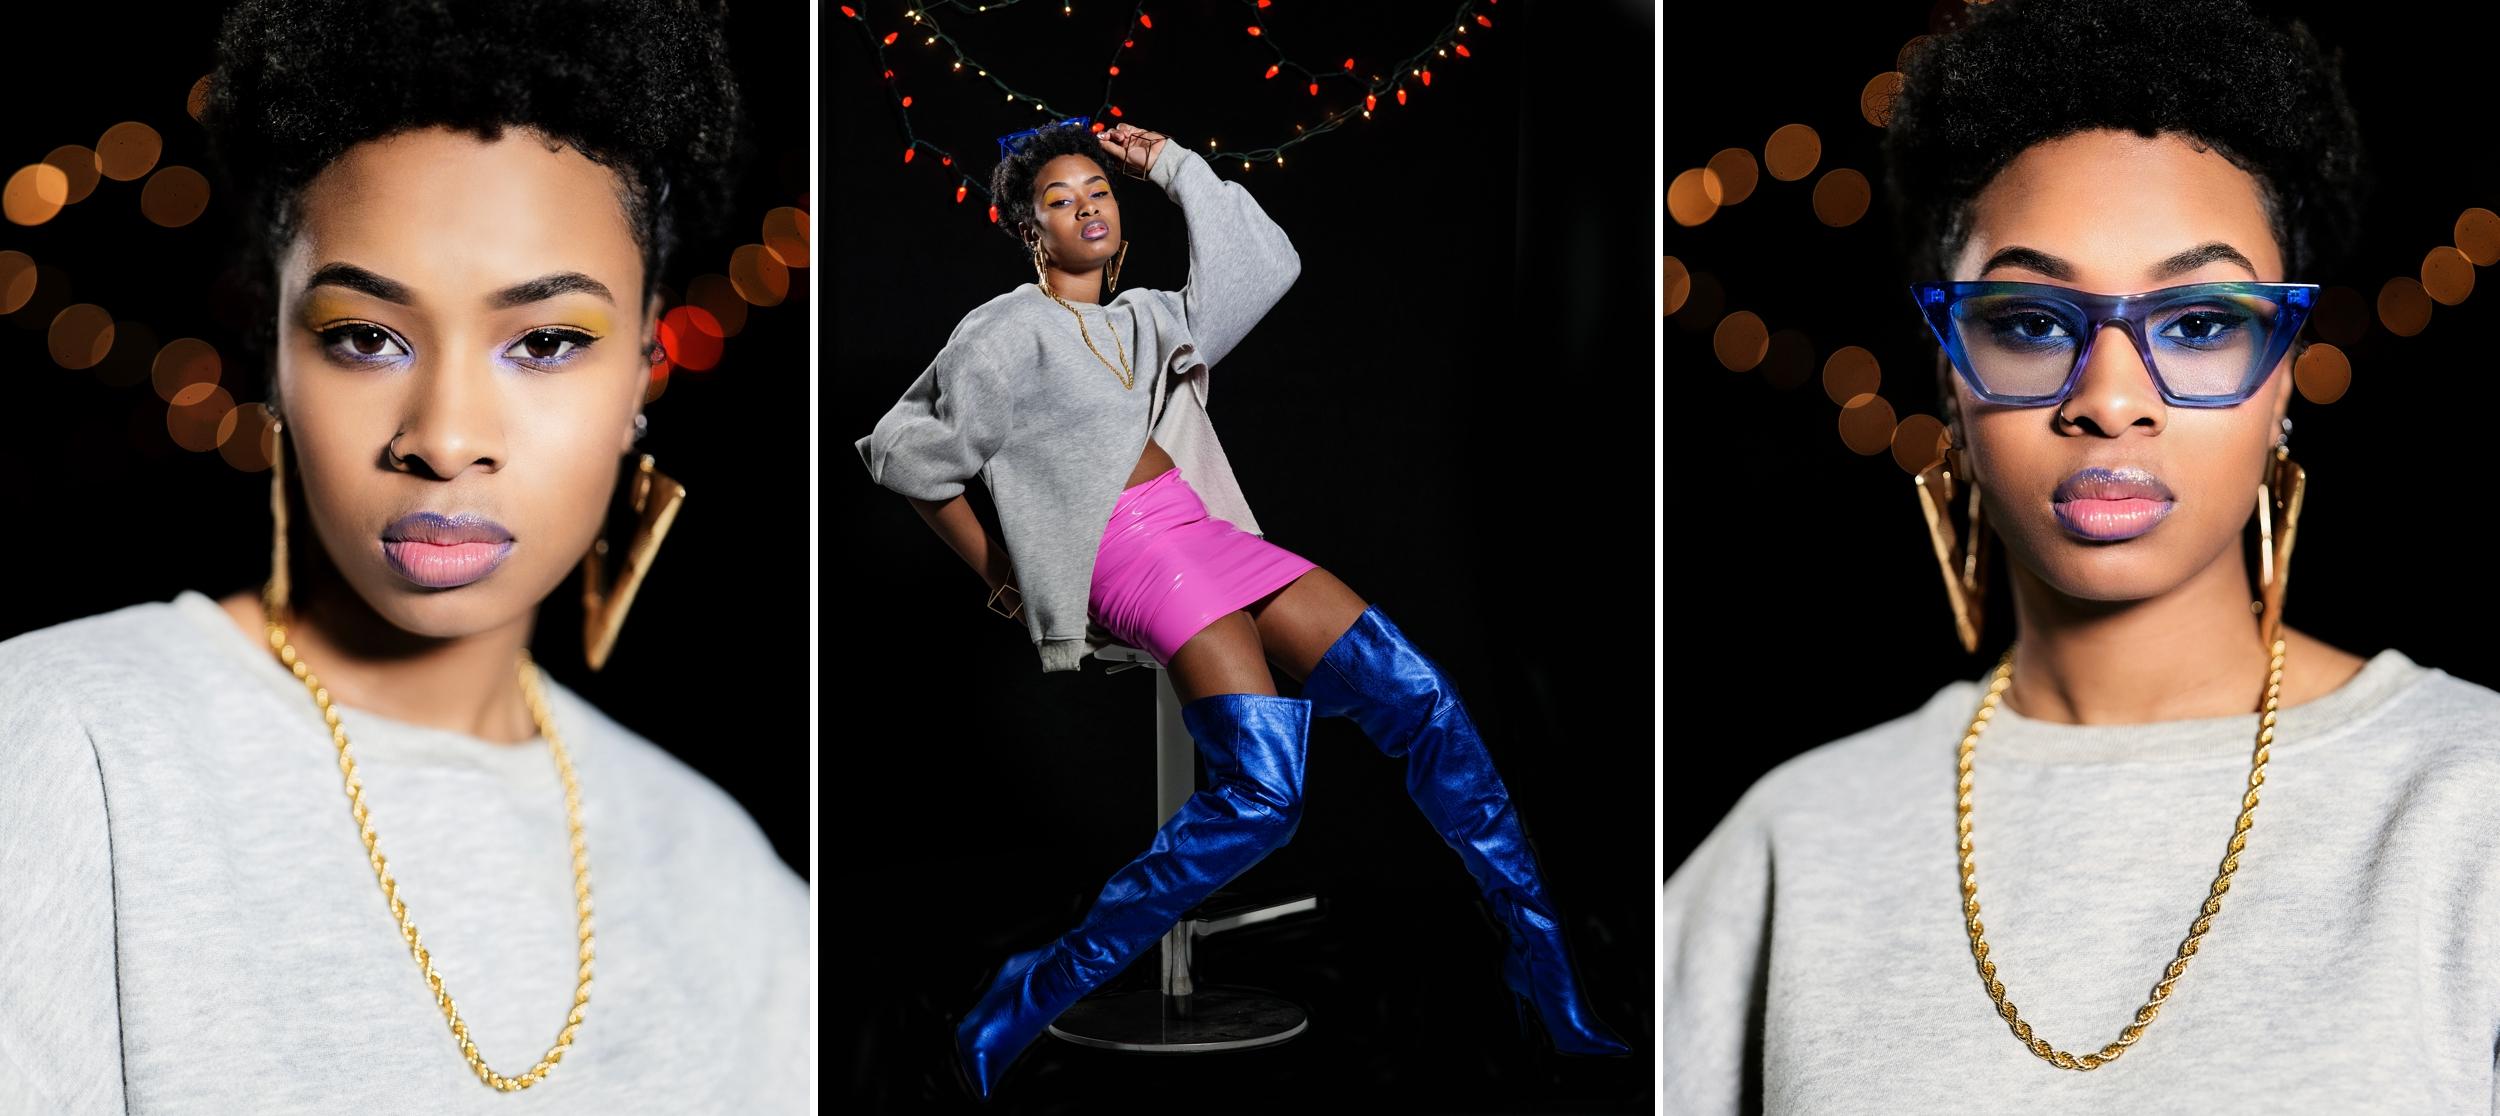 In studio portraits of a professional model.